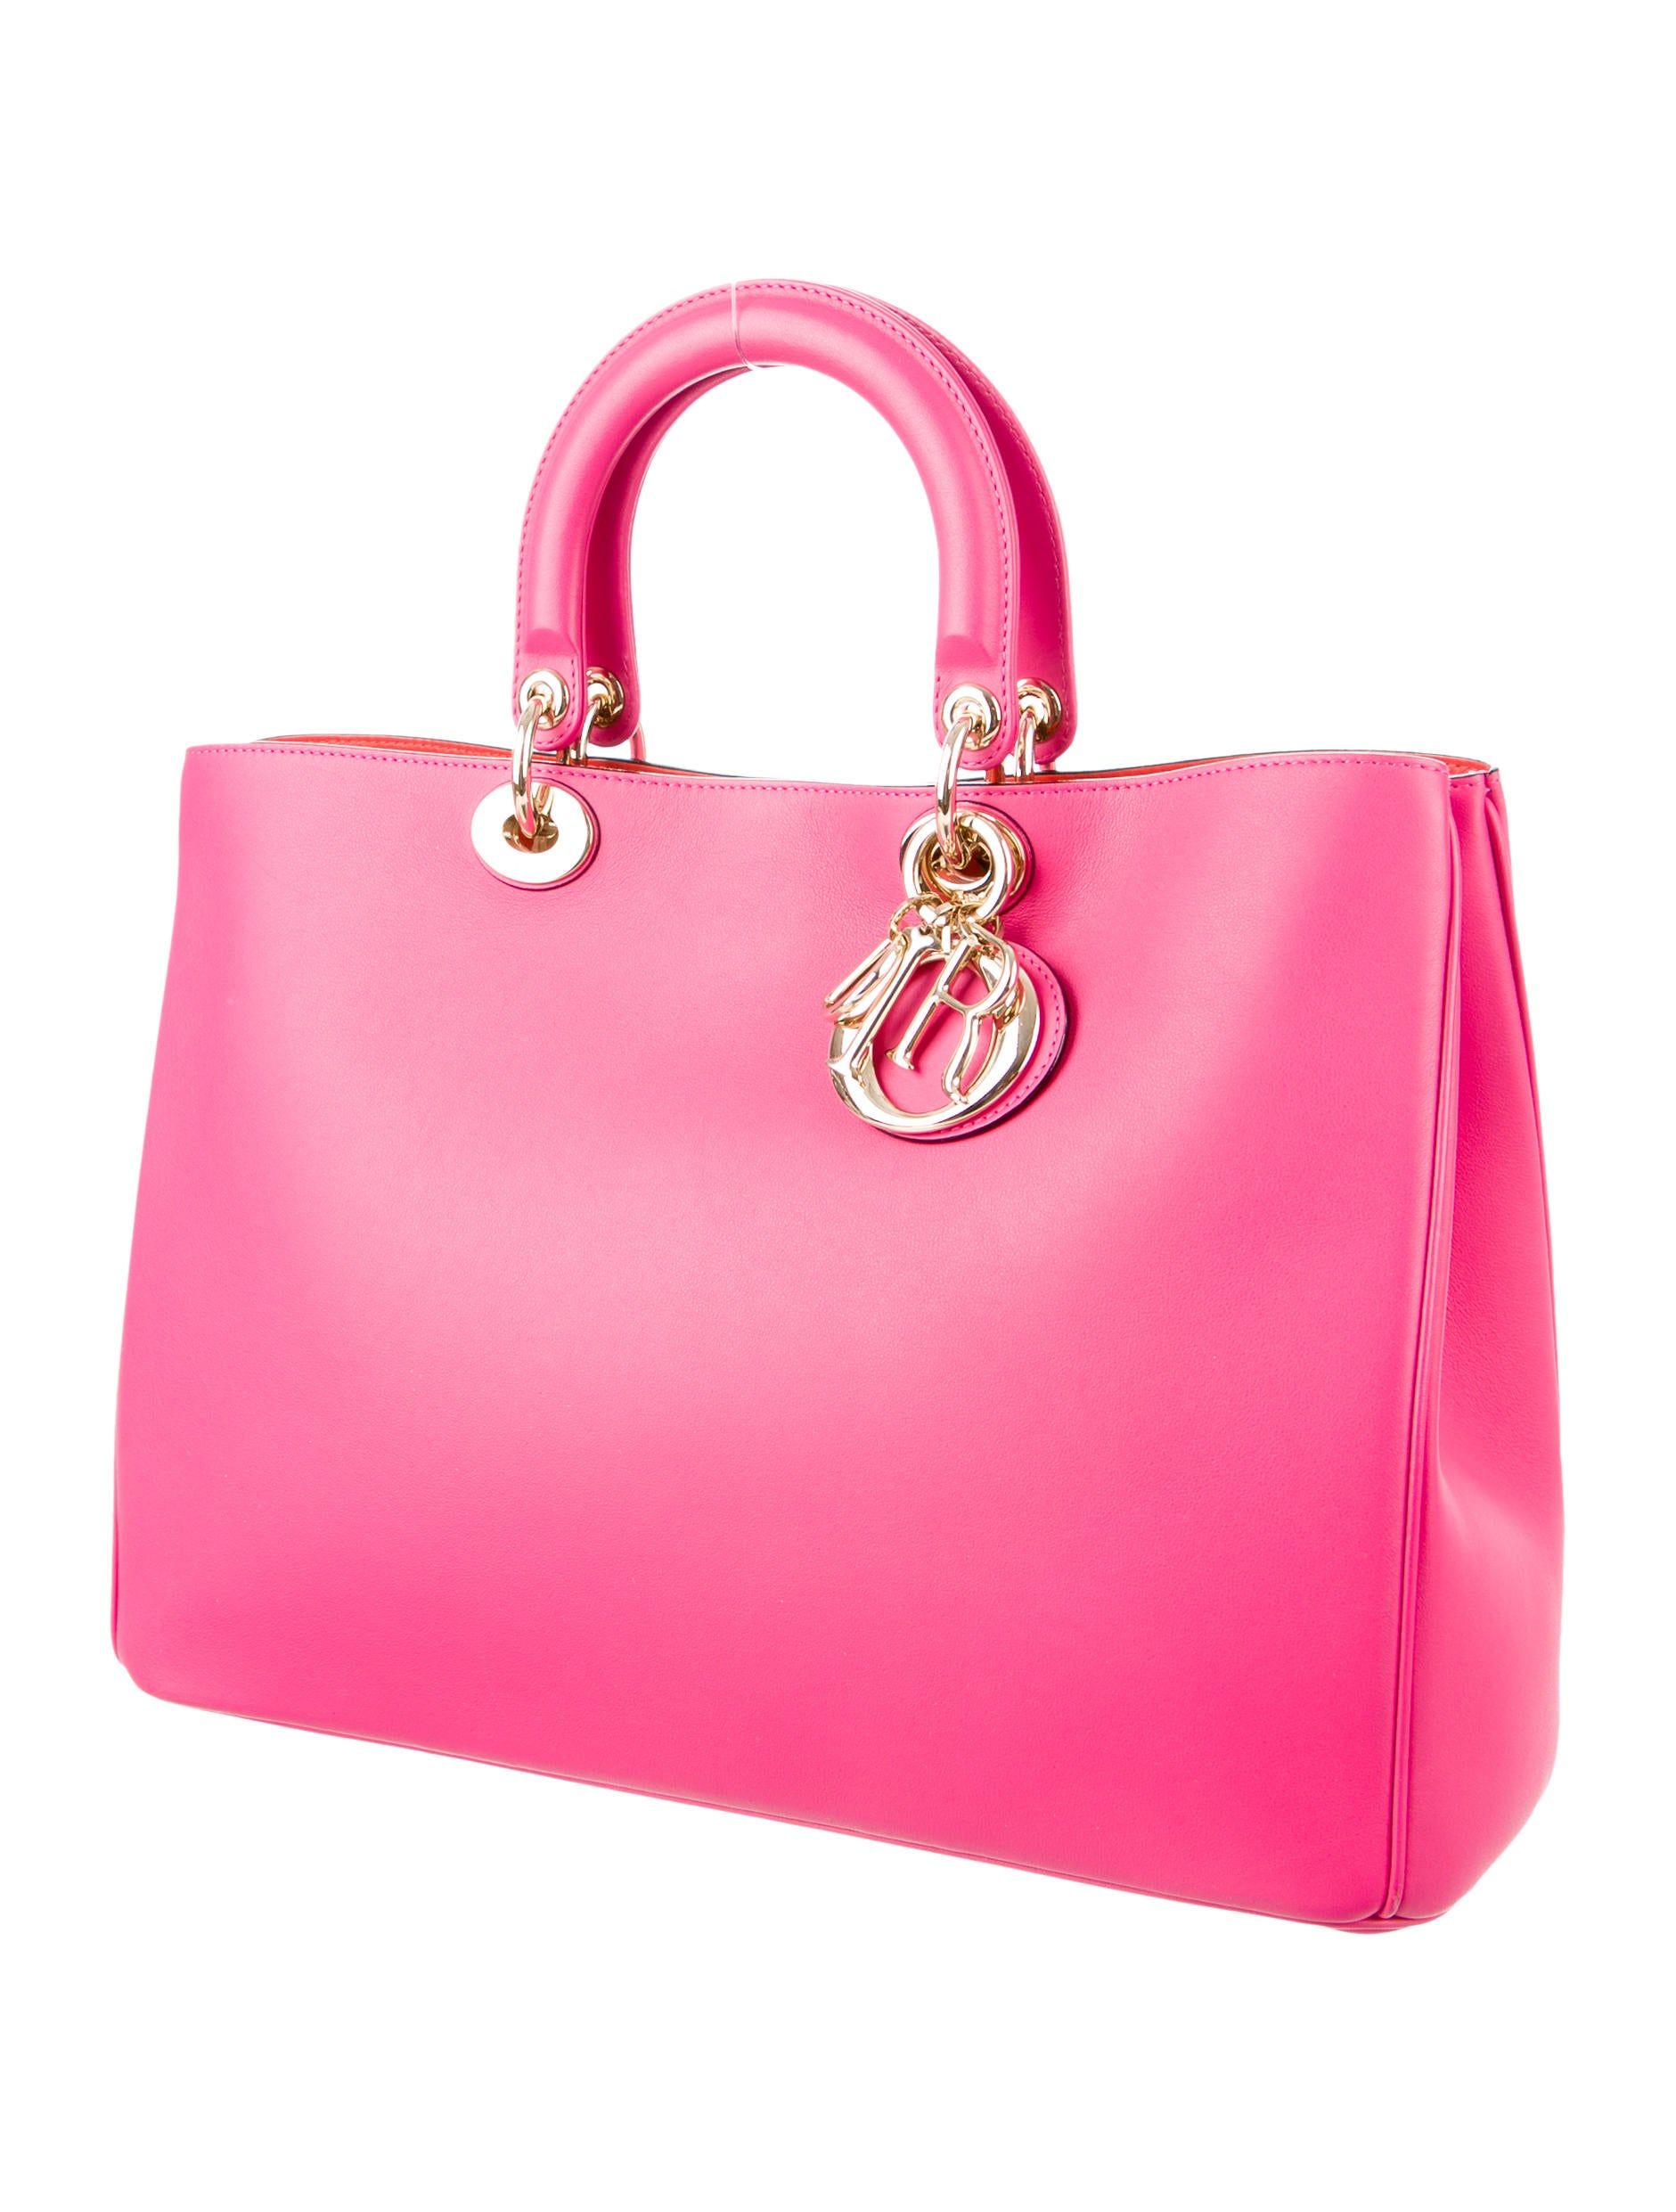 Simple Christian Dior Medium Bar Bag  Handbags  CHR36830  The RealReal